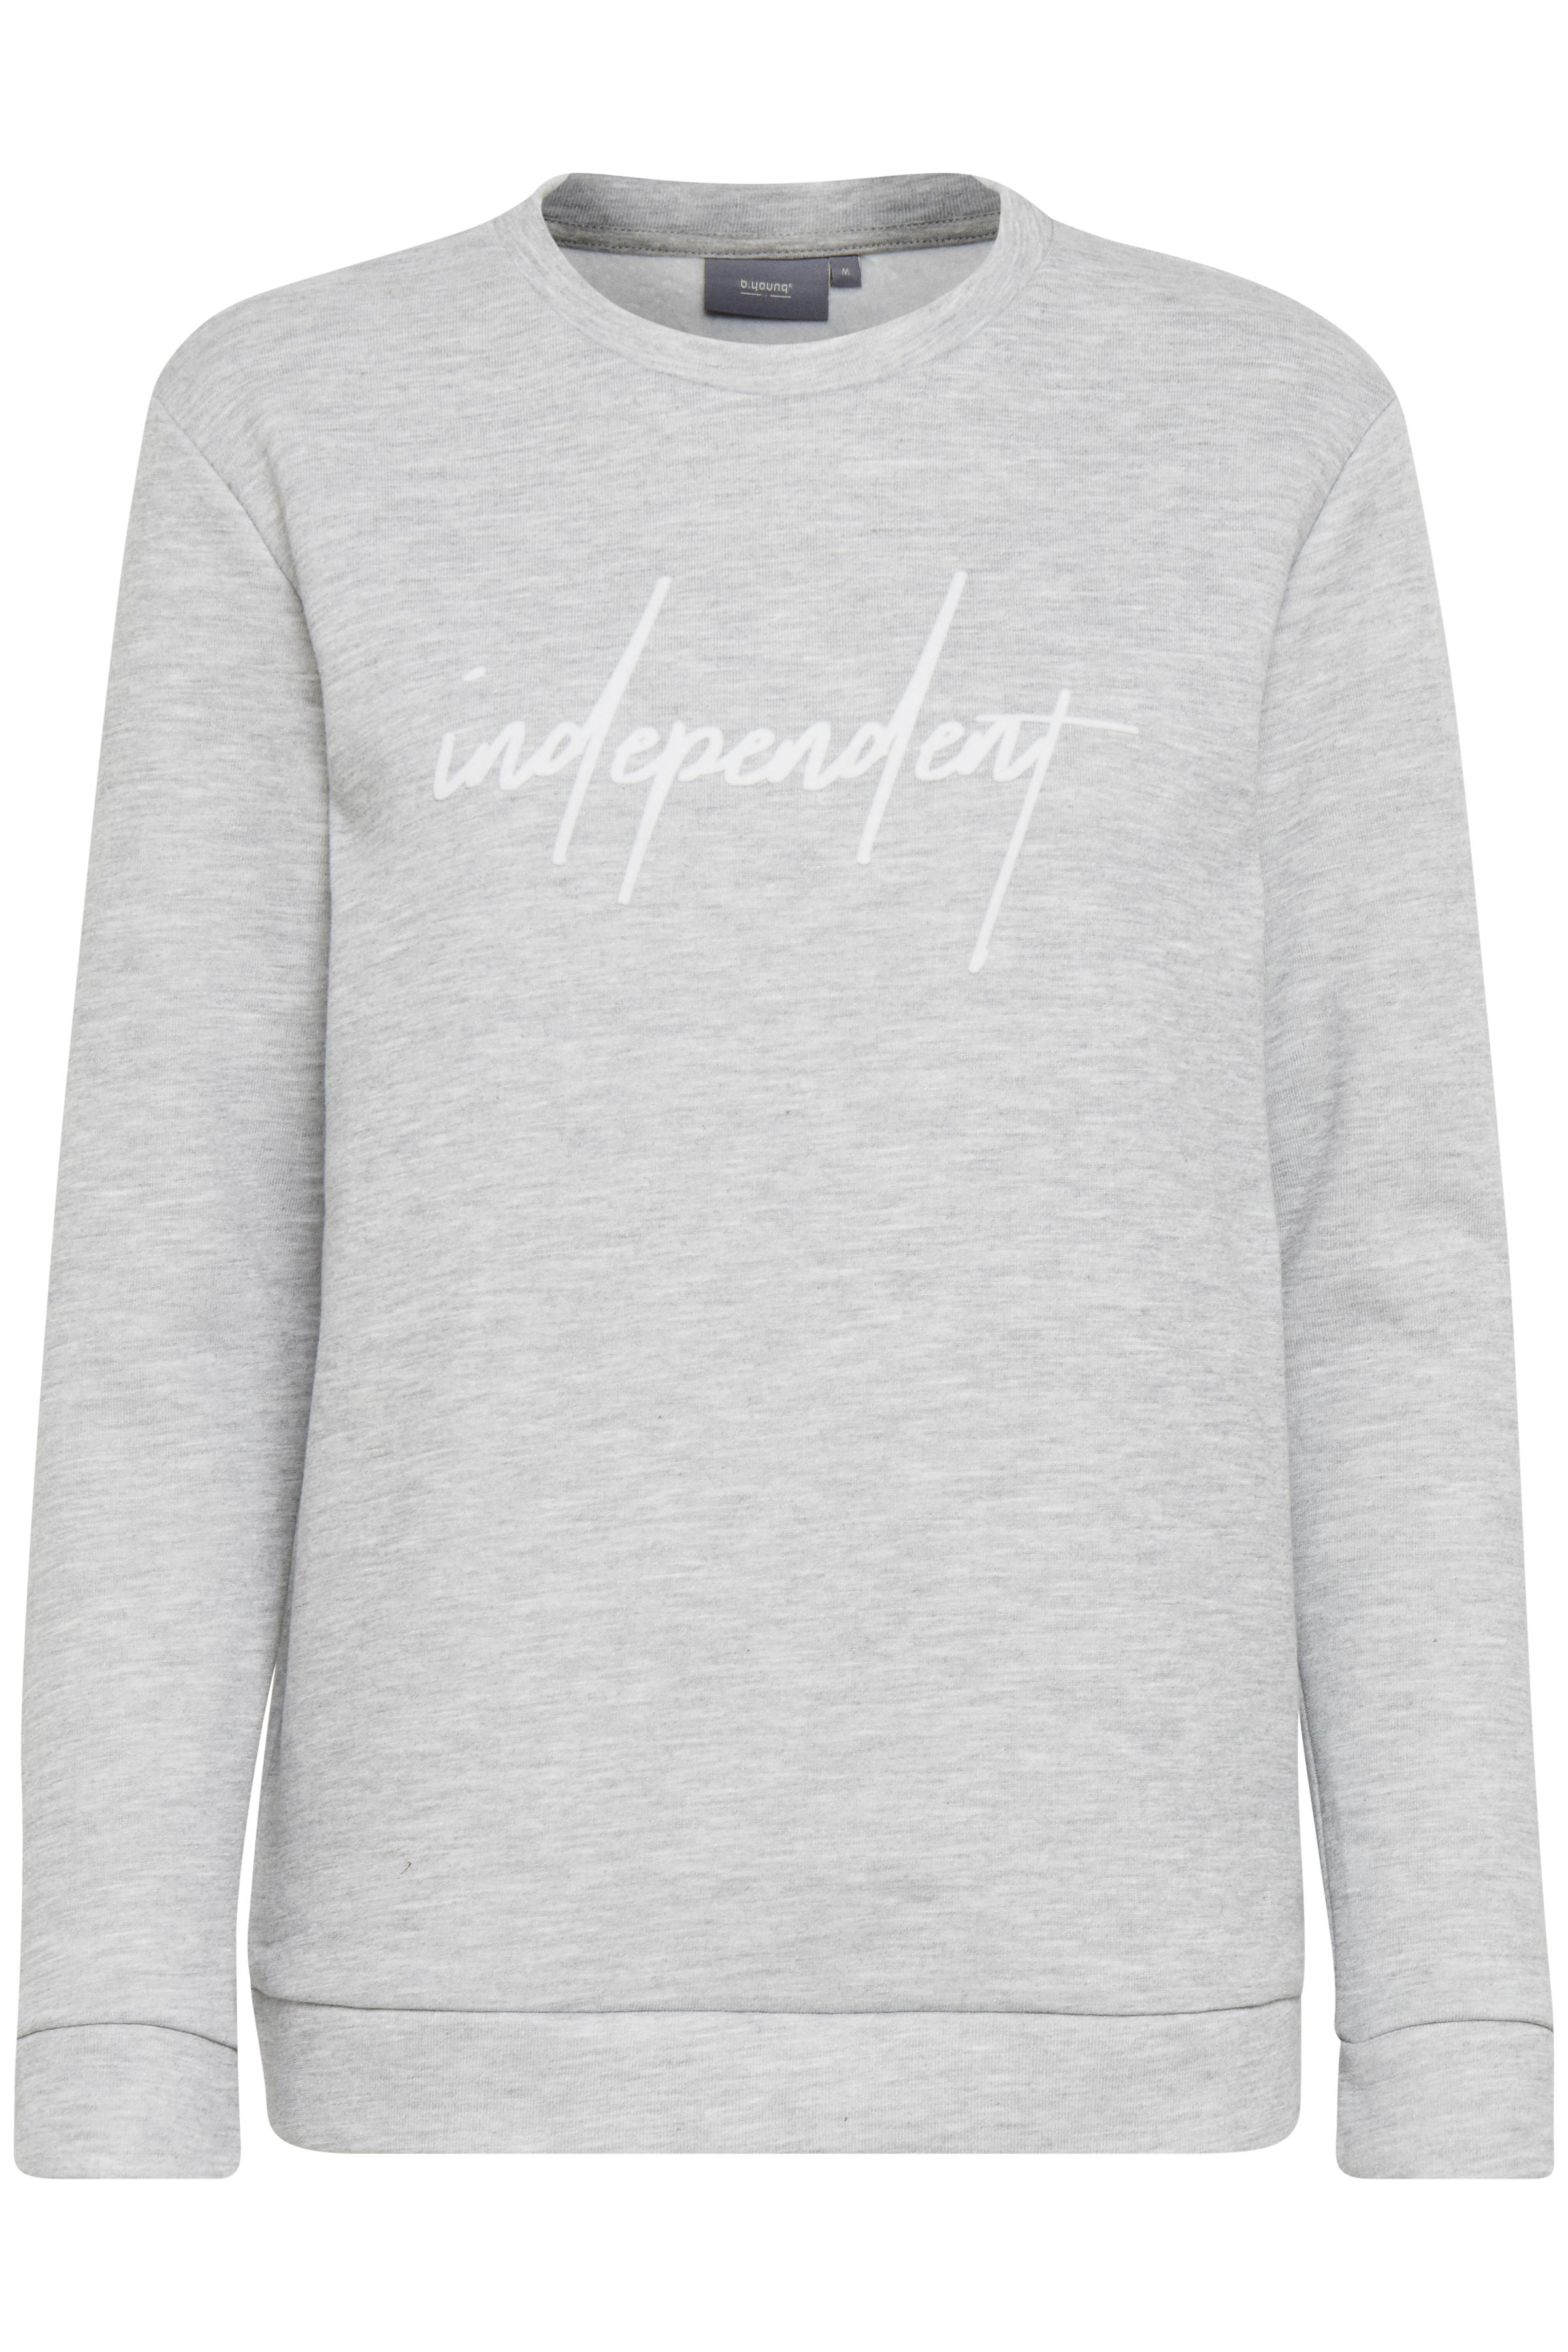 Lys gråmeleret Sweatshirt fra b.young – Køb Lys gråmeleret Sweatshirt fra str. XS-XXL her